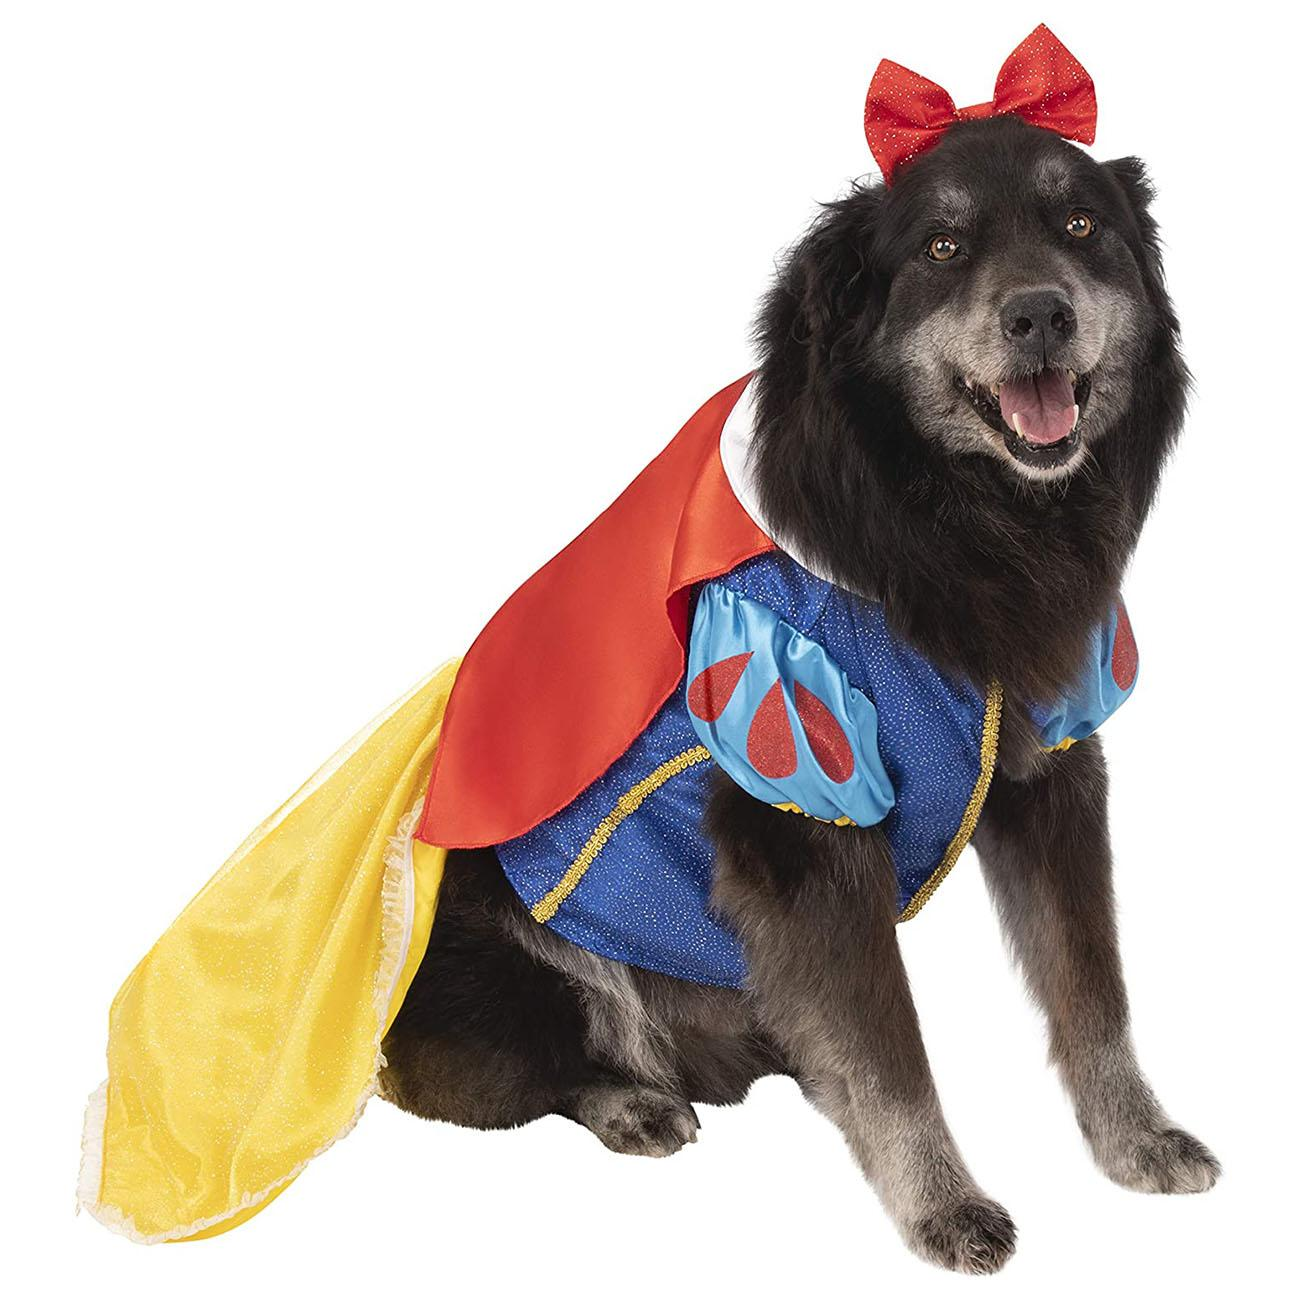 Disney's Big Dog Snow White Dog Costume by Rubie's